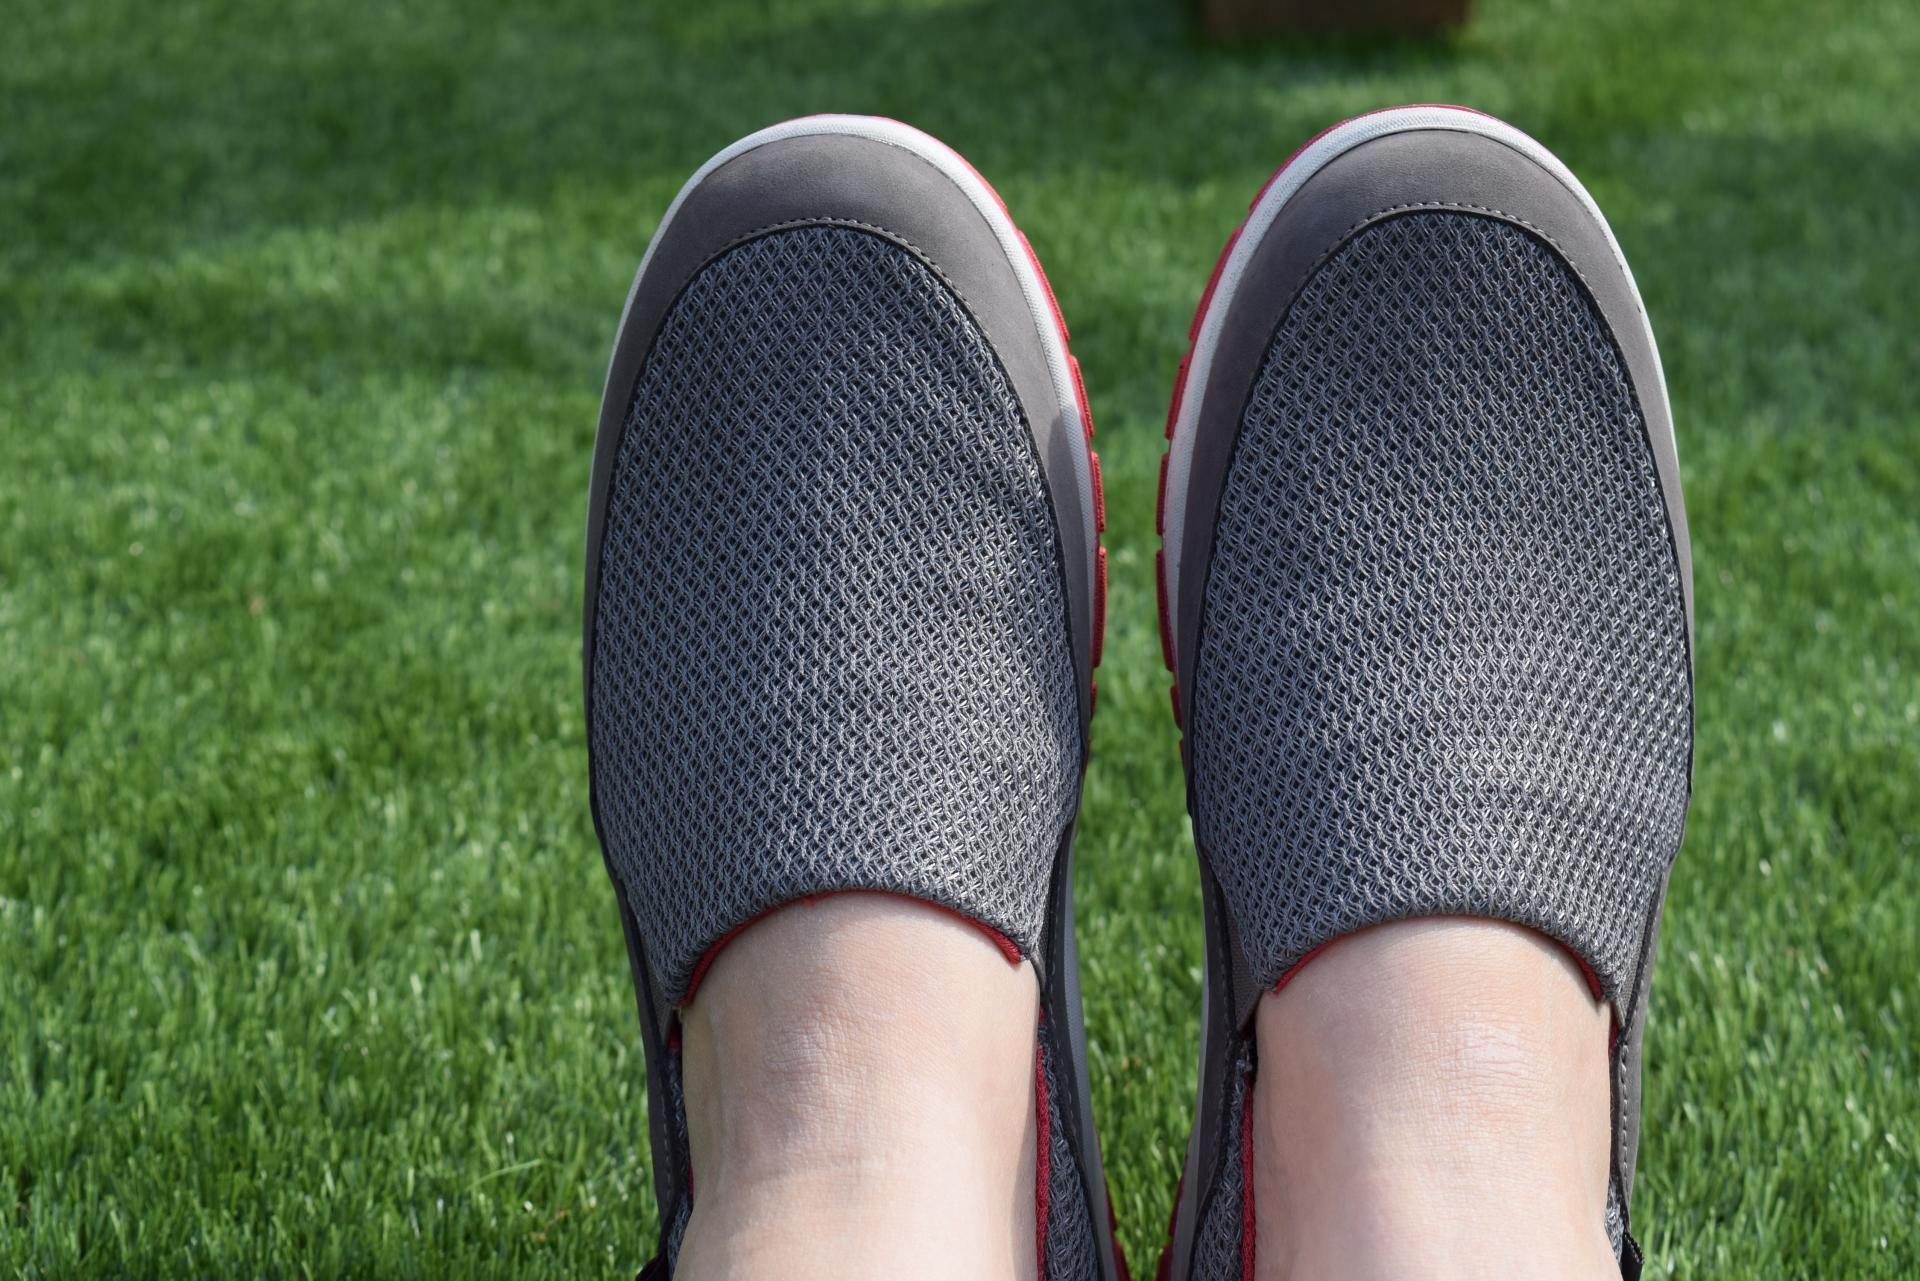 Strive Florida shoes